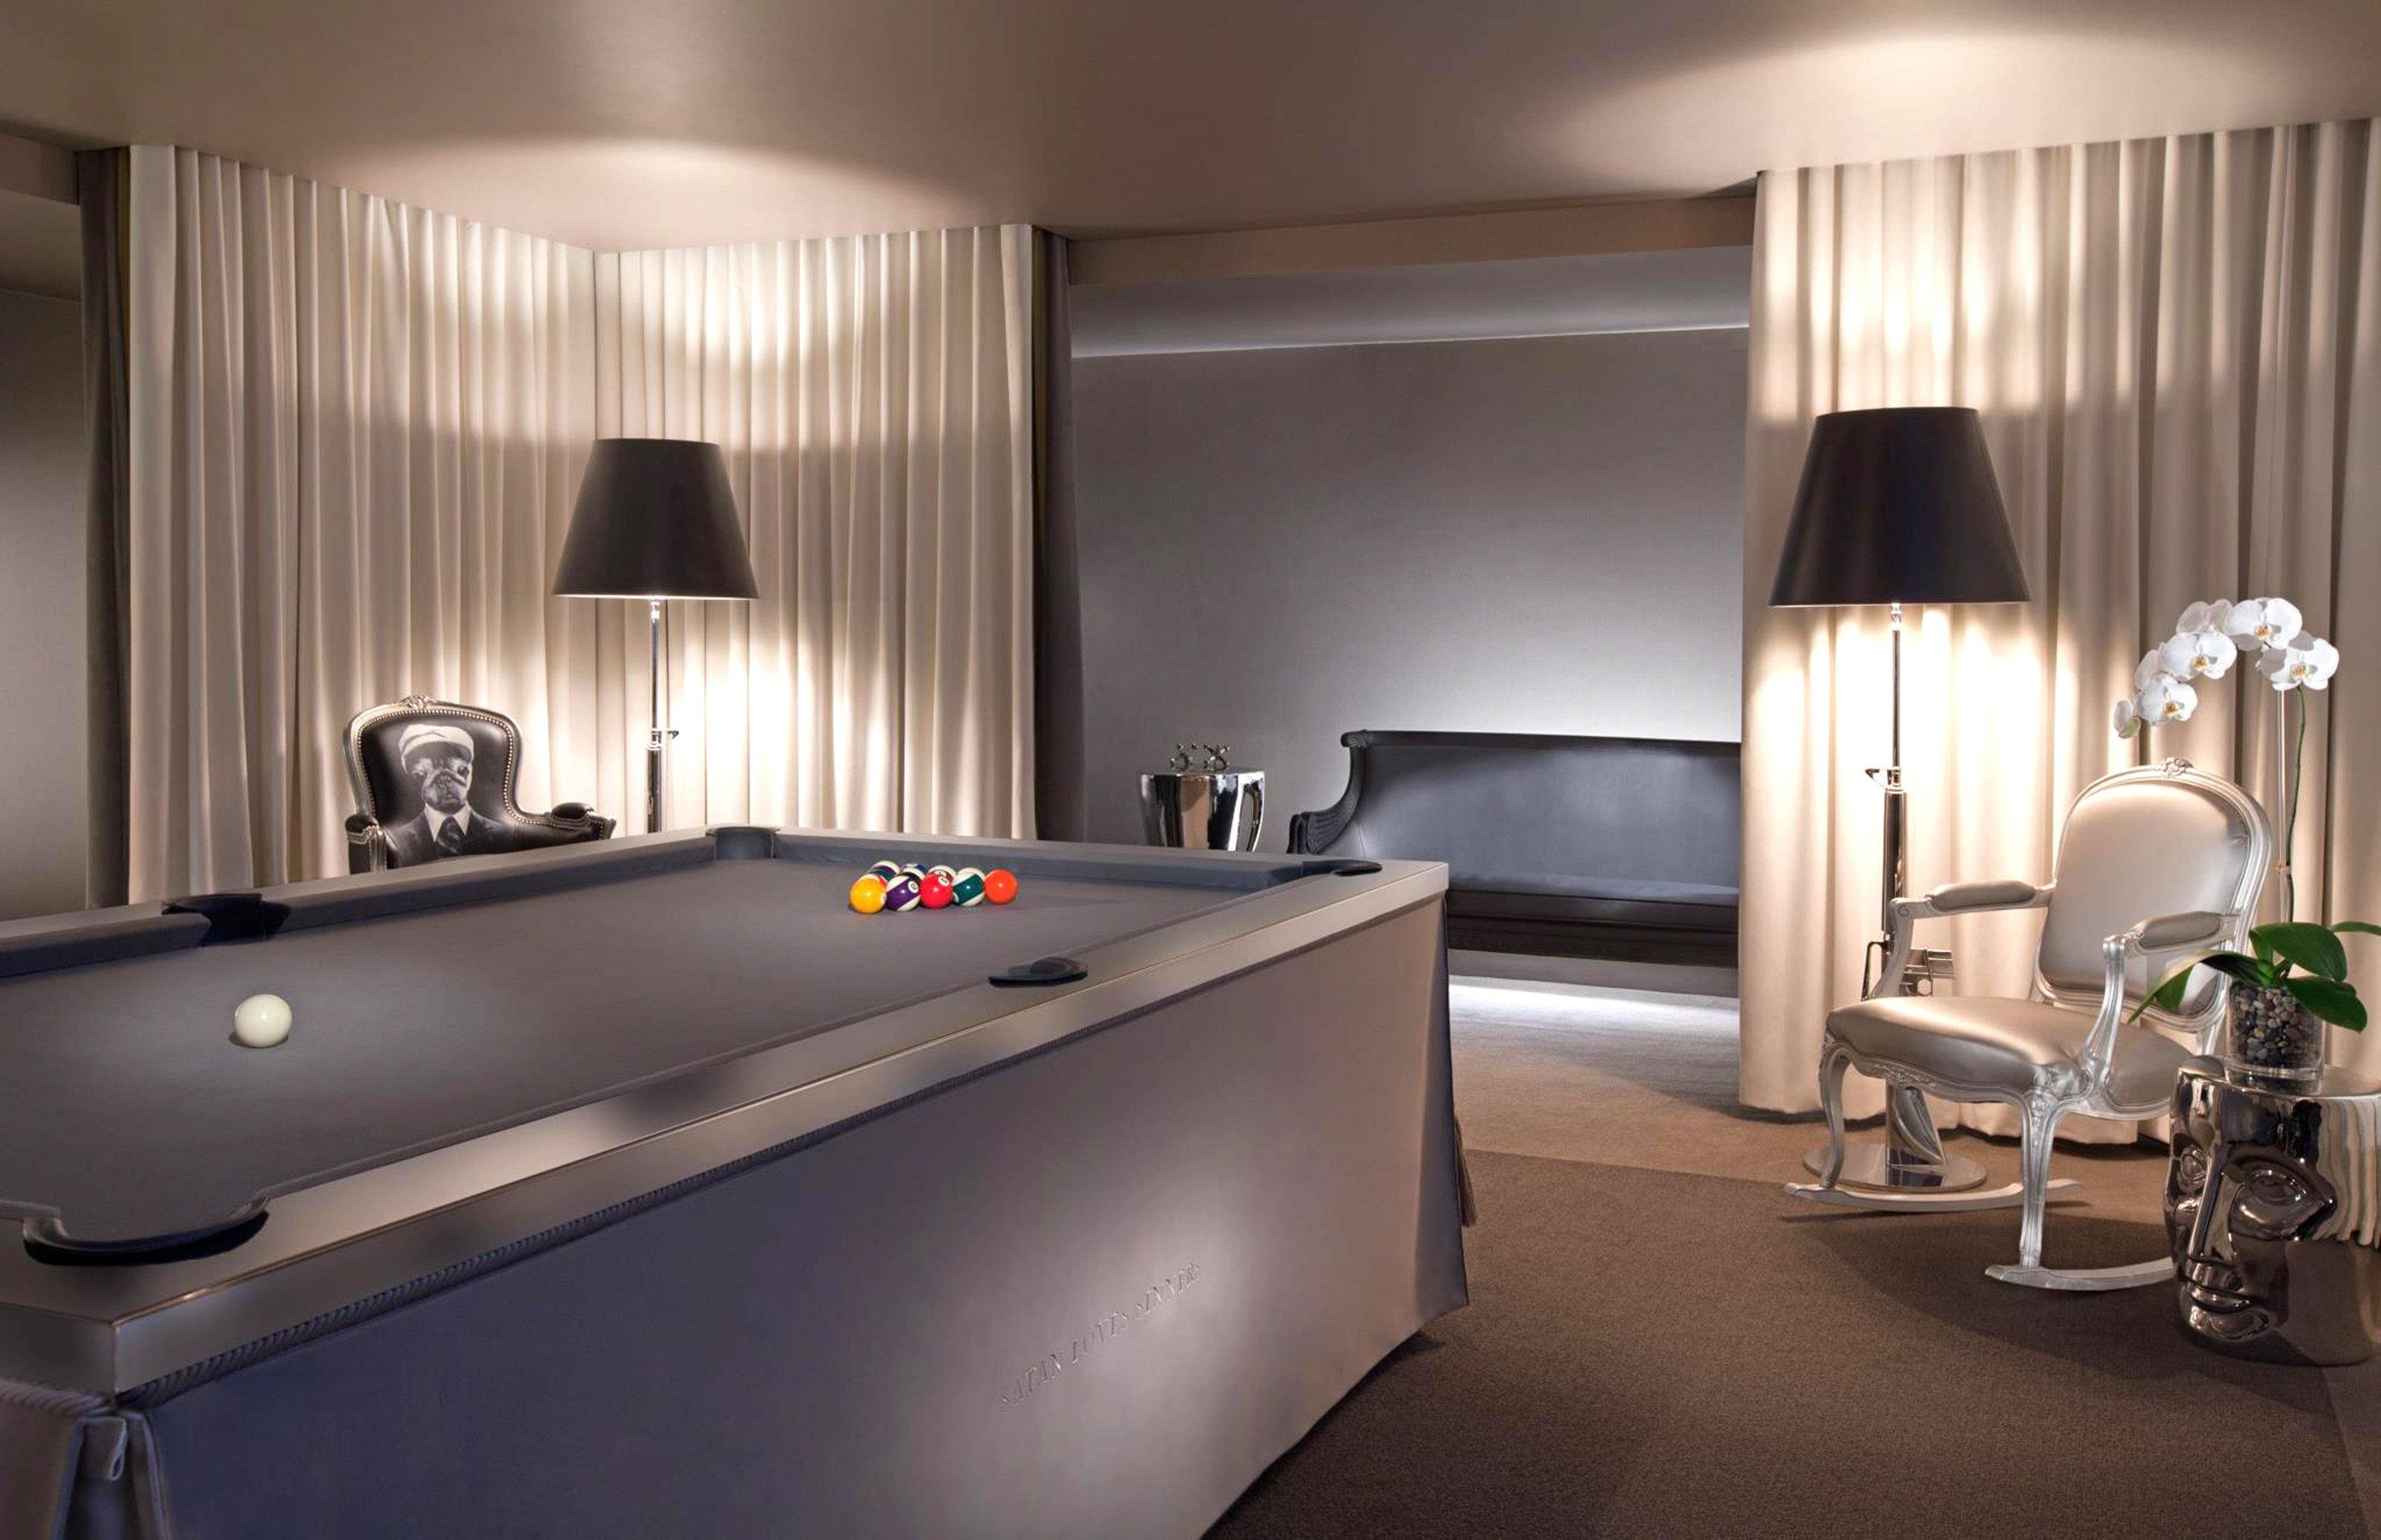 City Lounge Modern Play Sport property recreation room Suite billiard room lighting Bedroom